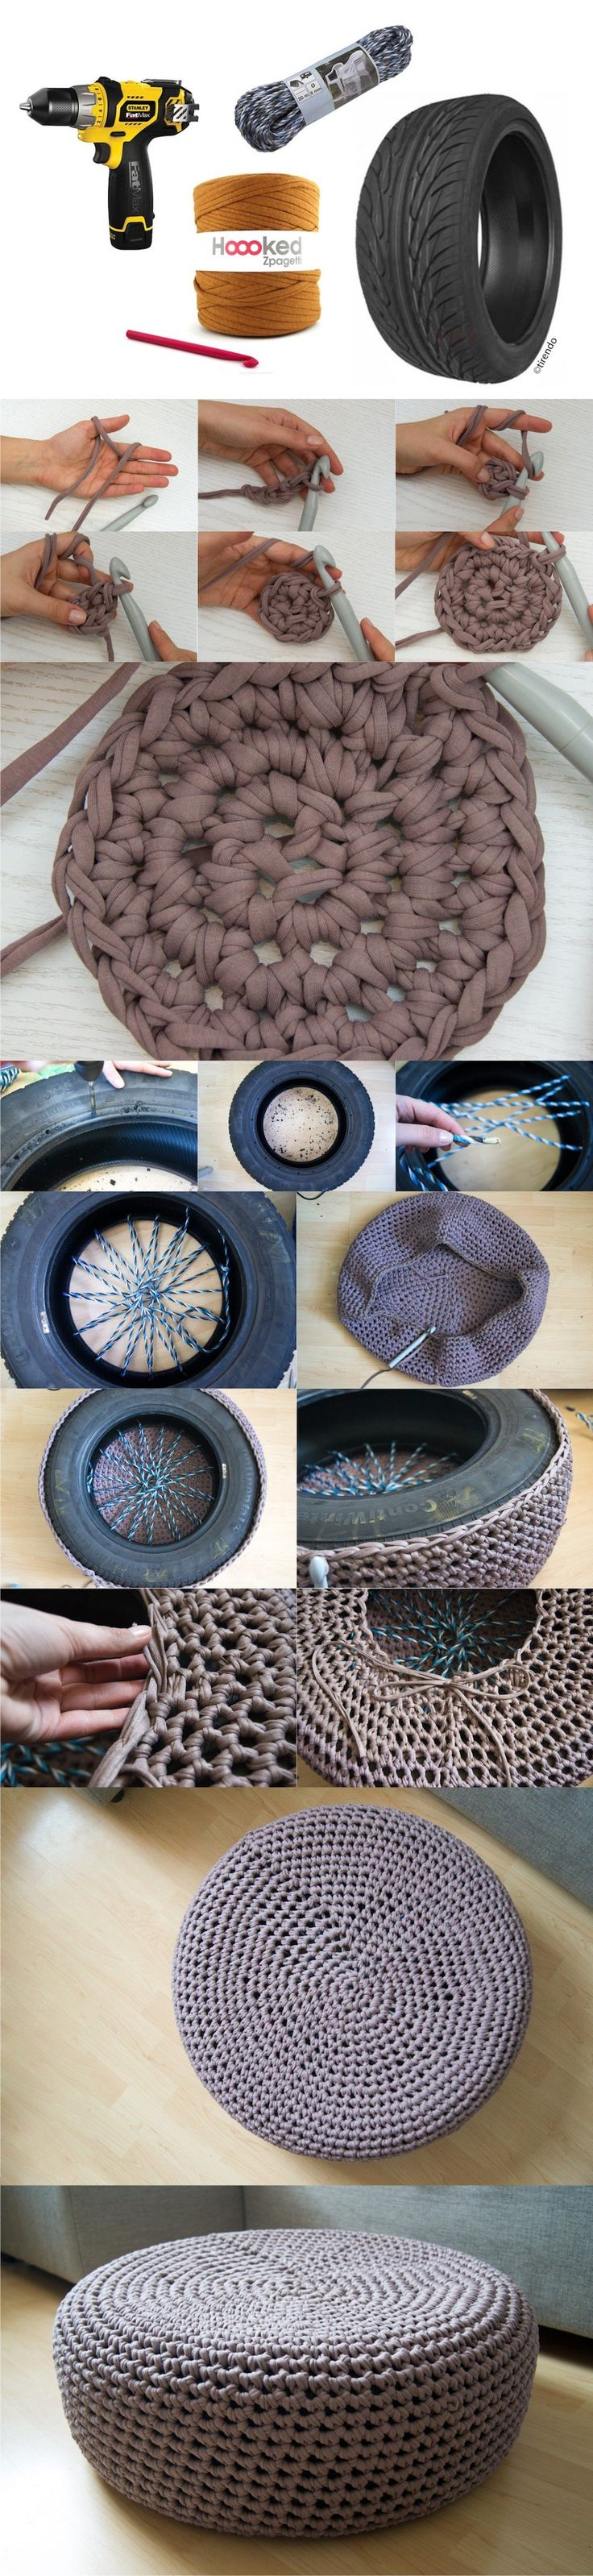 Buena idea para reciclar neumático - yellowgirl.at - DIY Crochet Tire Puff